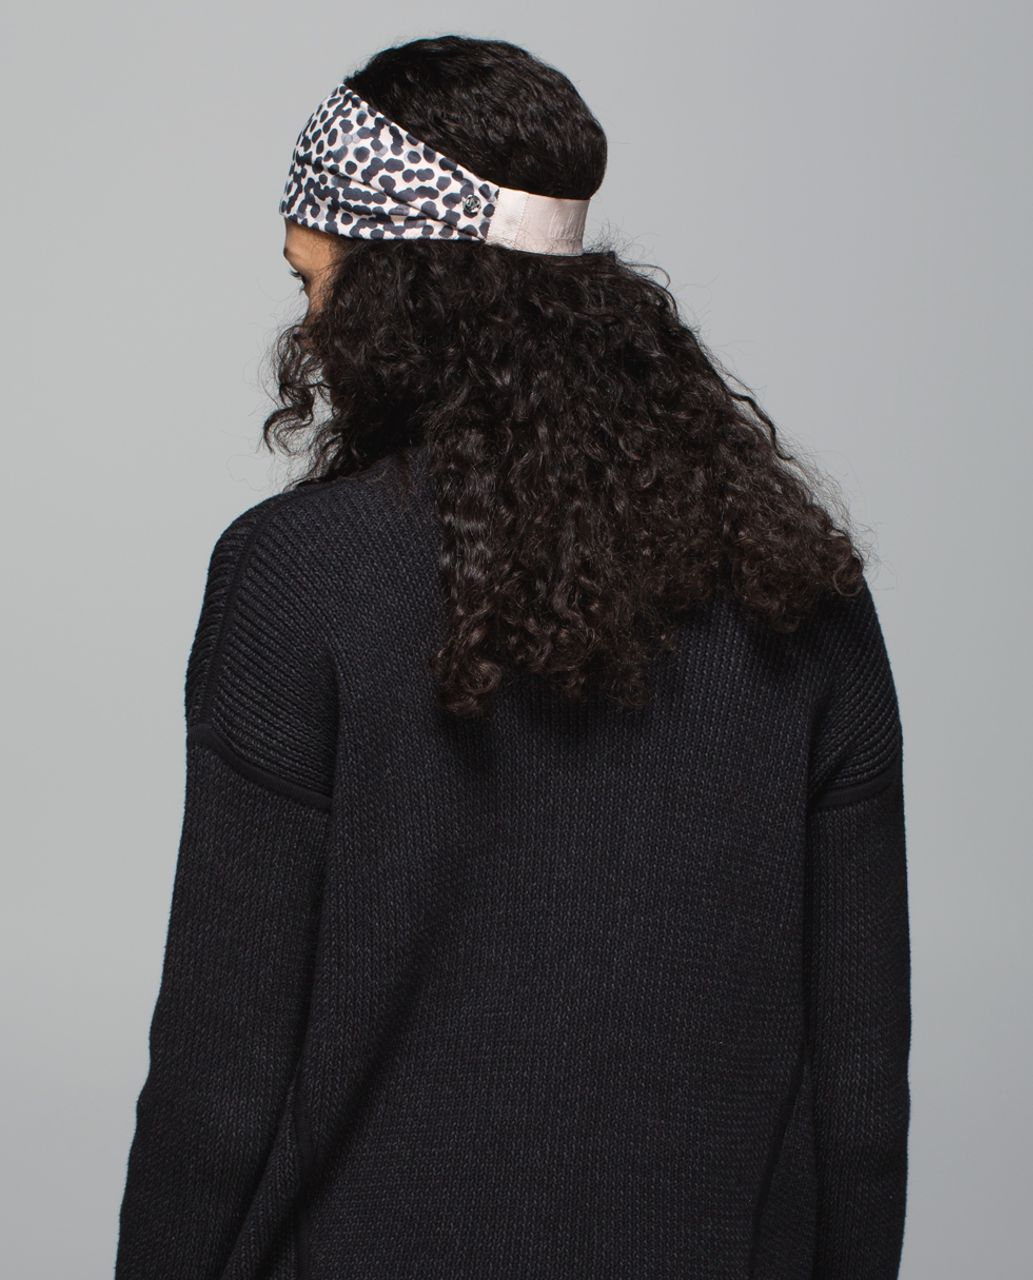 Lululemon Fringe Fighter Headband - Ace Spot Grain Black / Heathered Alarming